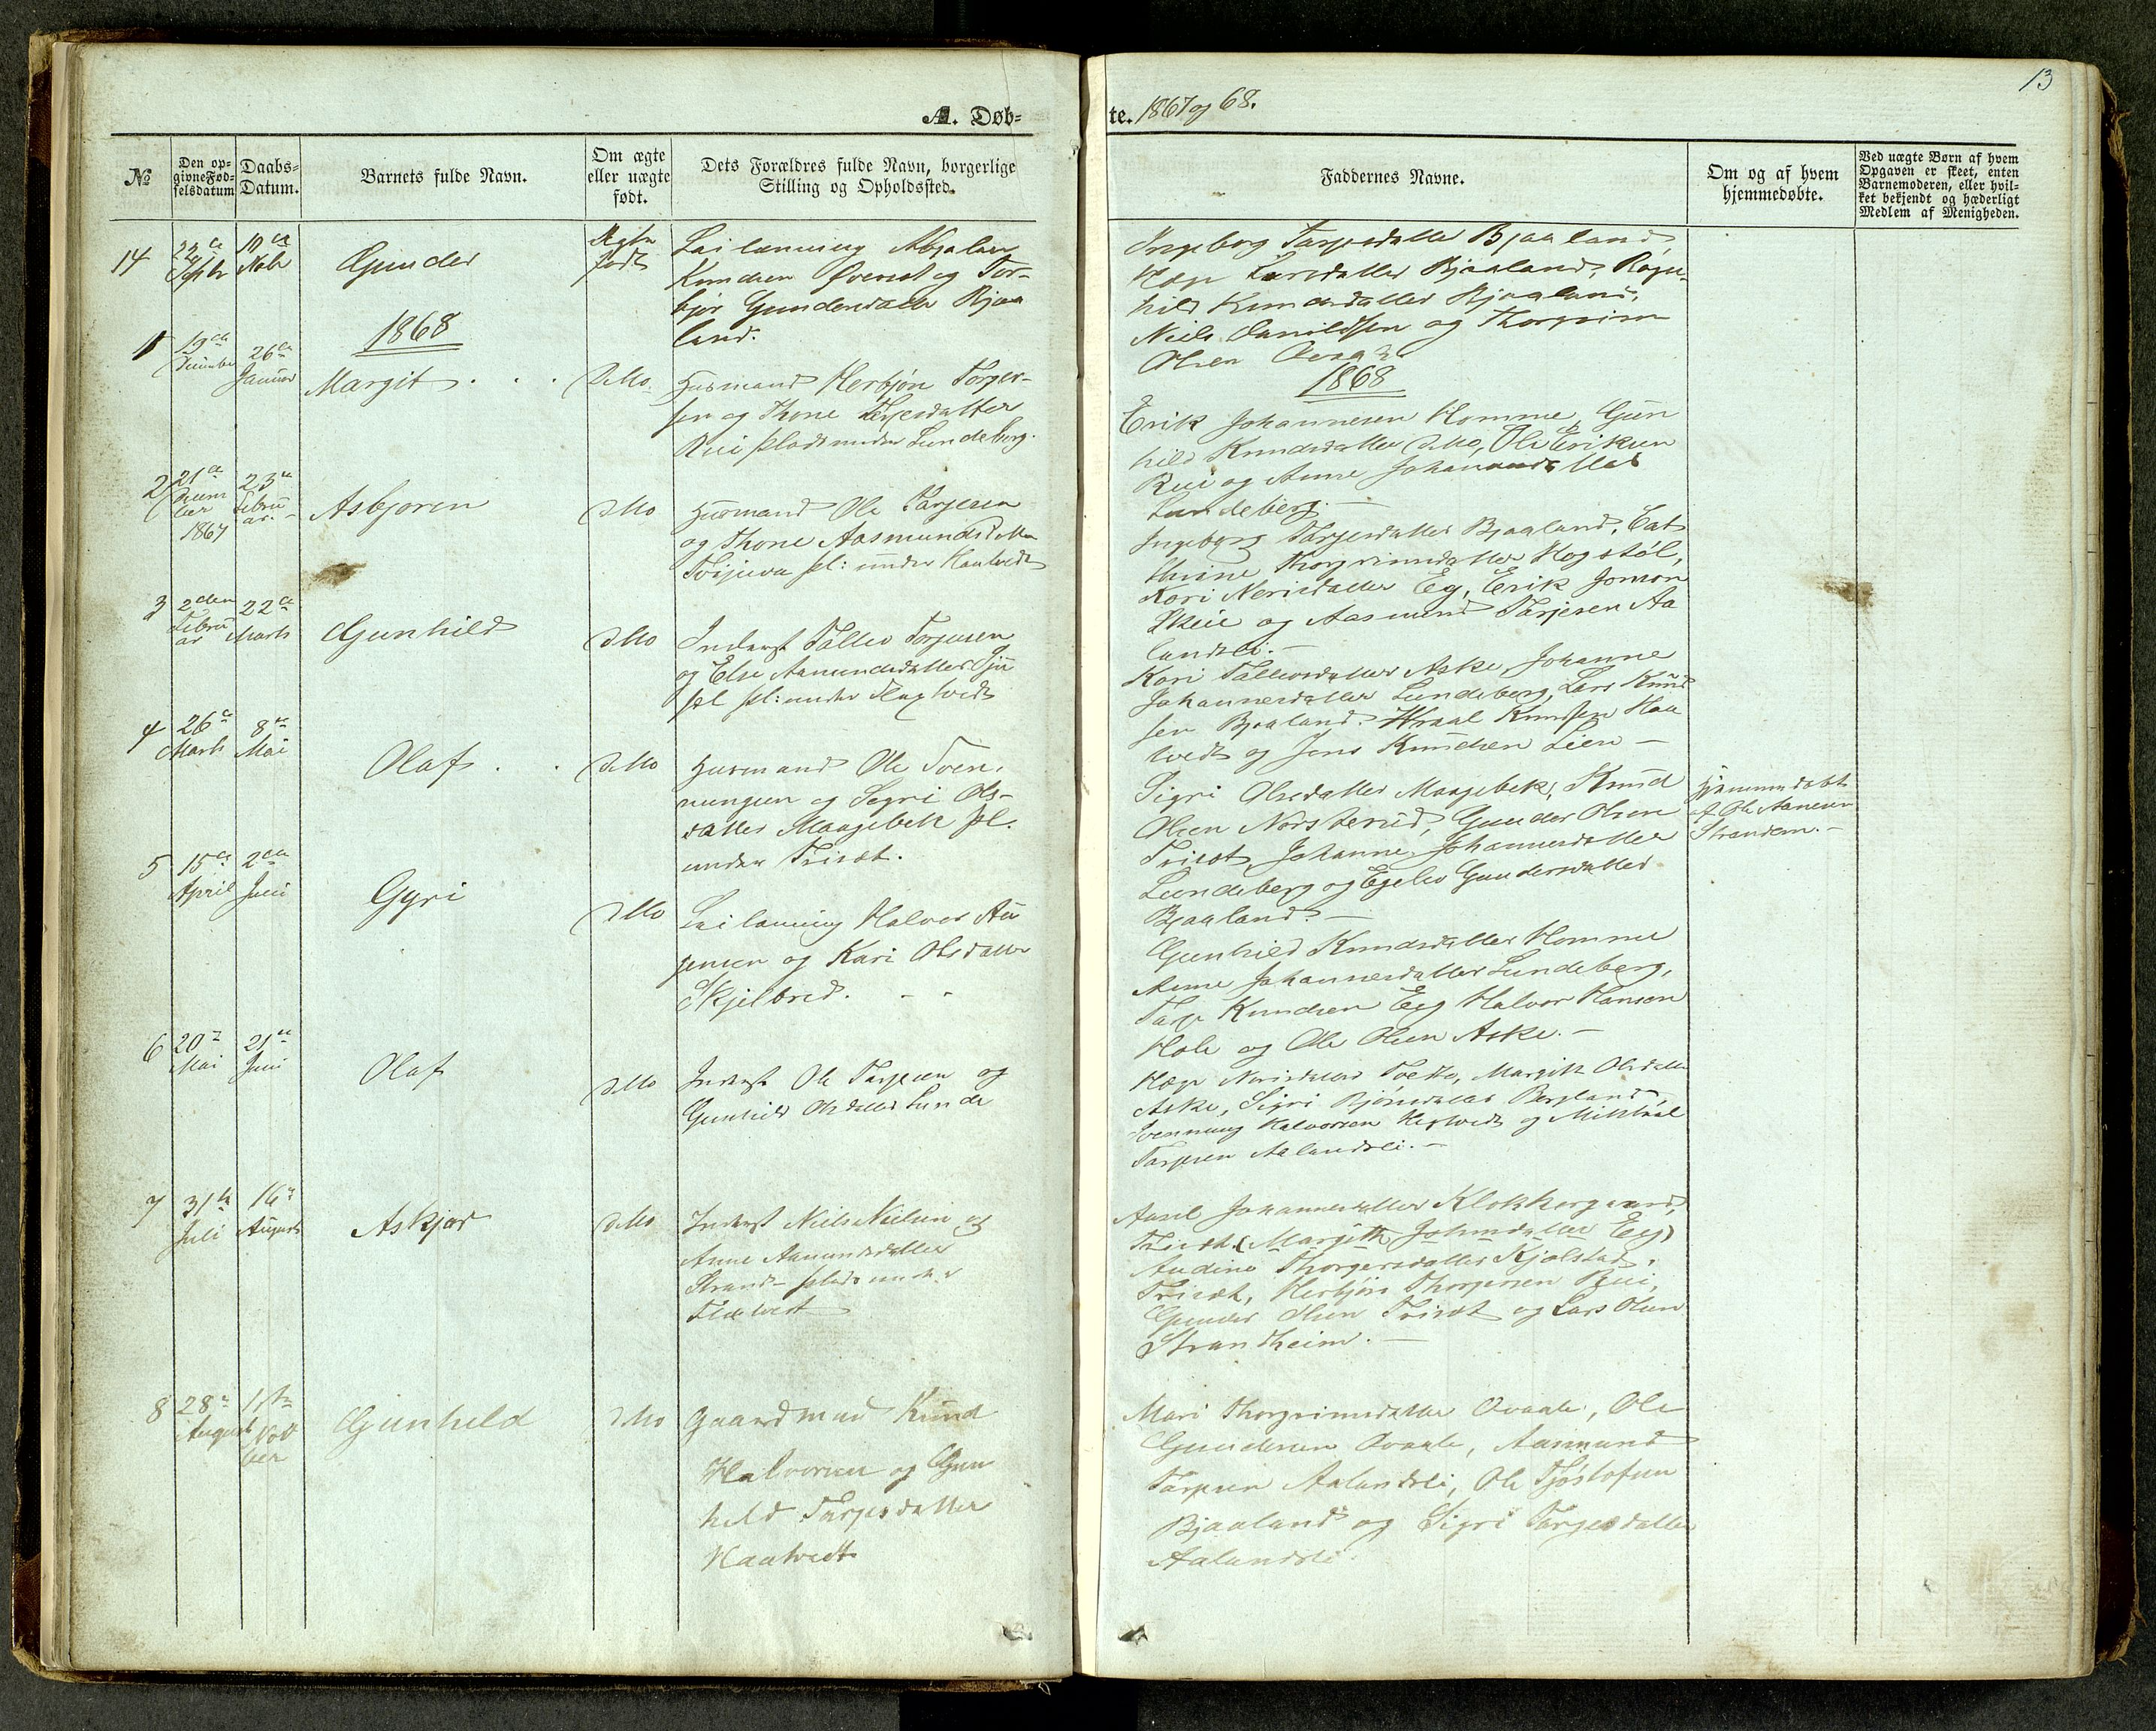 SAKO, Lårdal kirkebøker, G/Ga/L0002: Klokkerbok nr. I 2, 1861-1890, s. 13